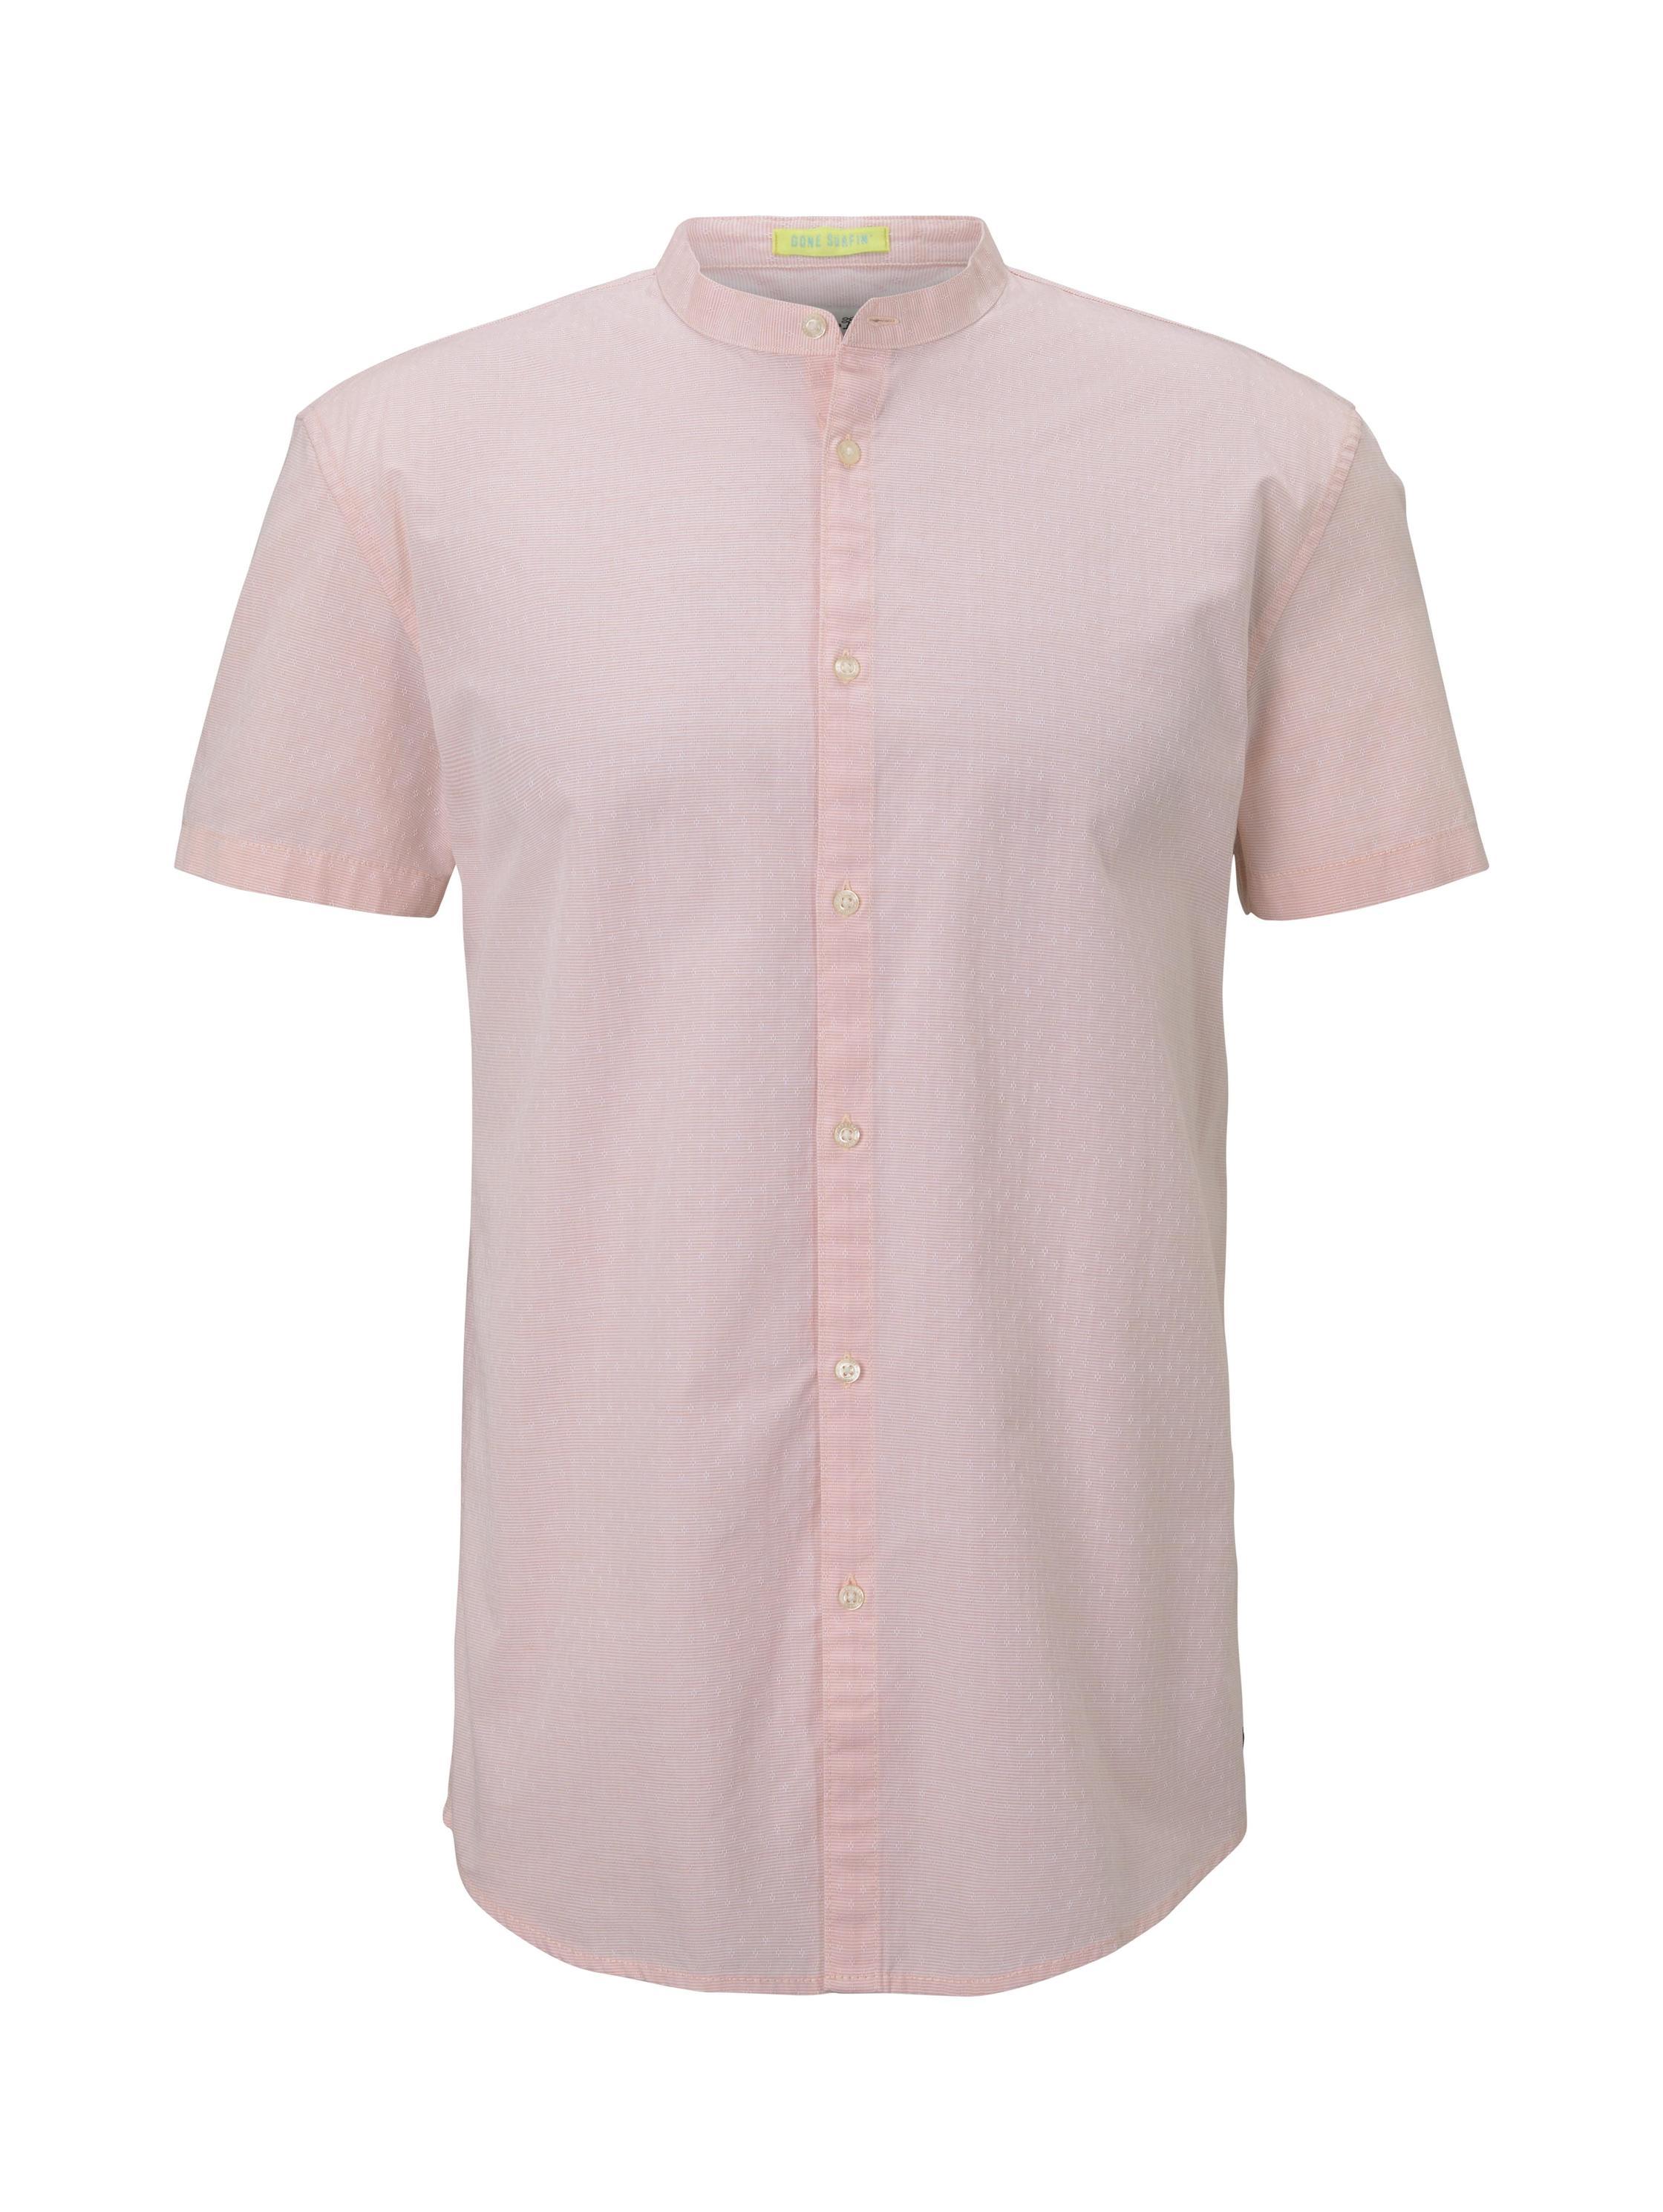 cotton jacquard shirt, orange dobby dot structure